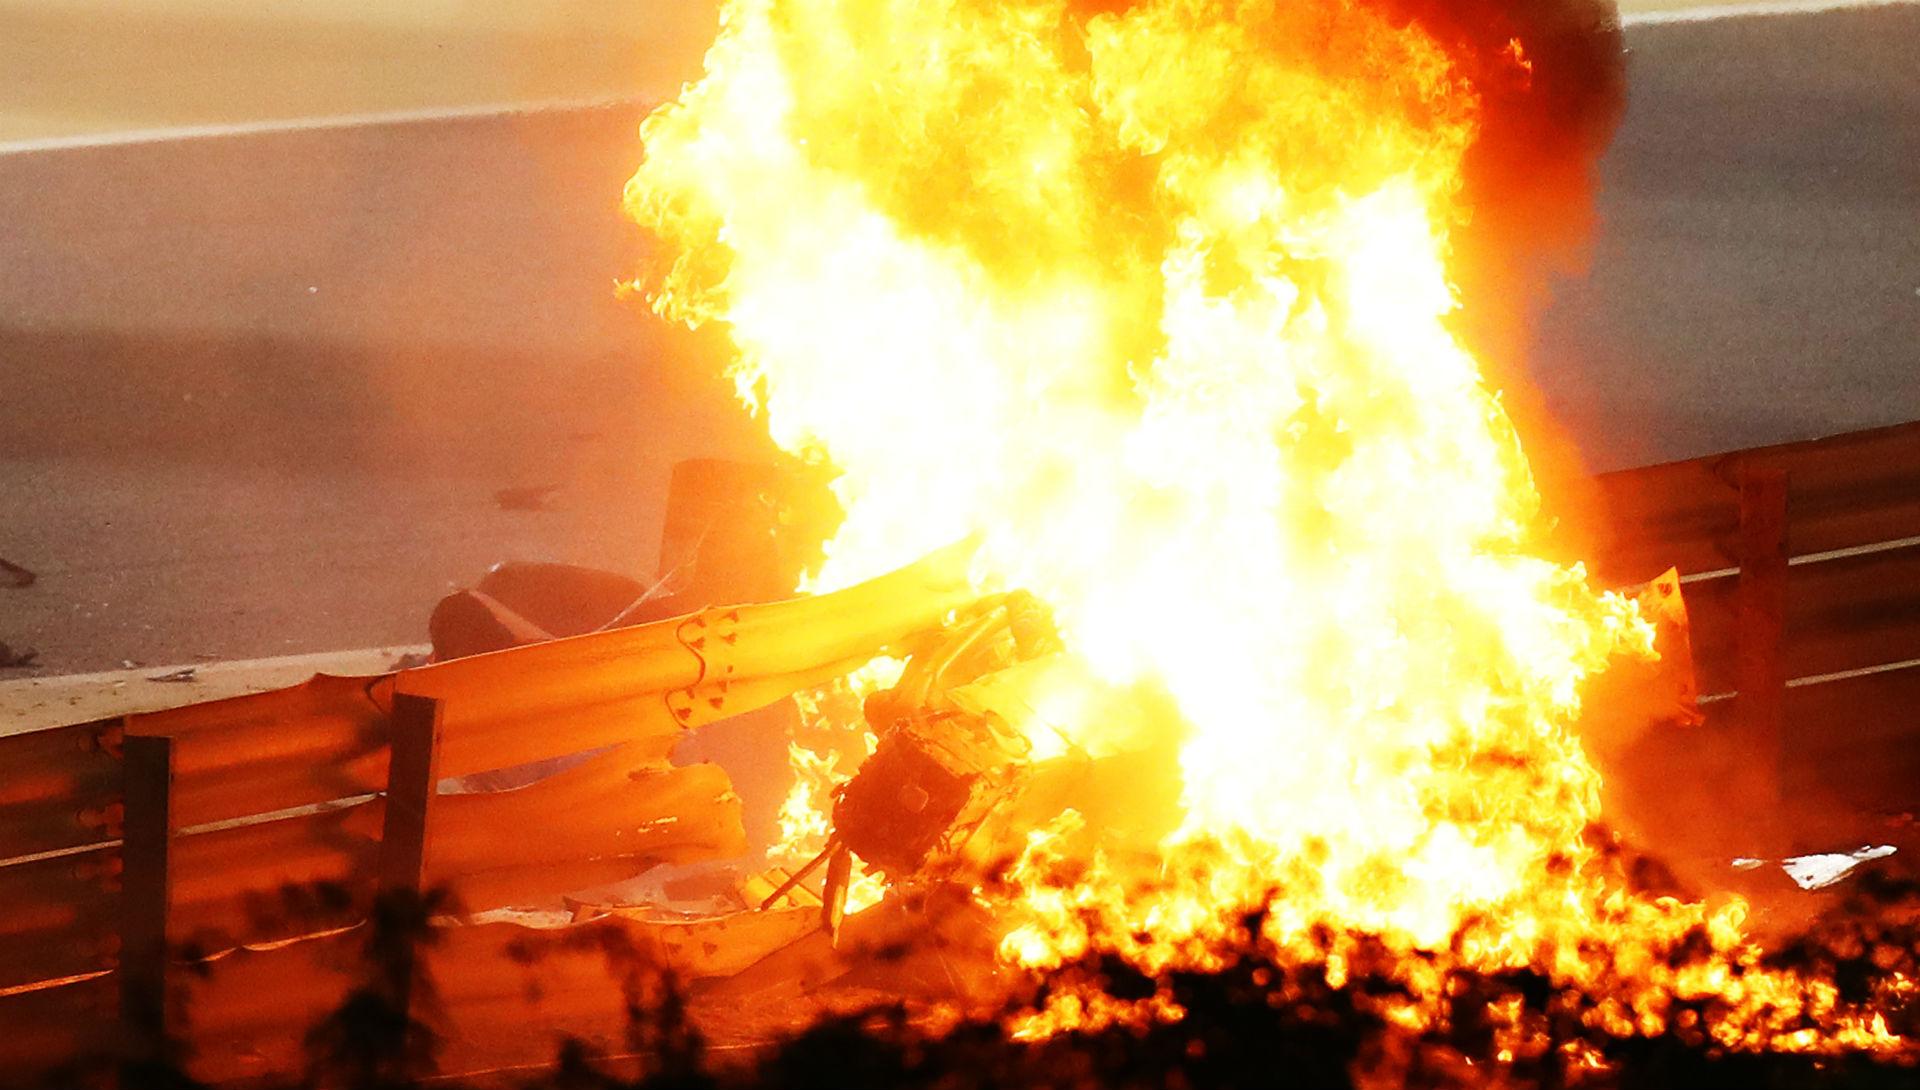 F1 driver Romain Grosjean miraculously escapes fiery crash at Bahrain Grand Prix